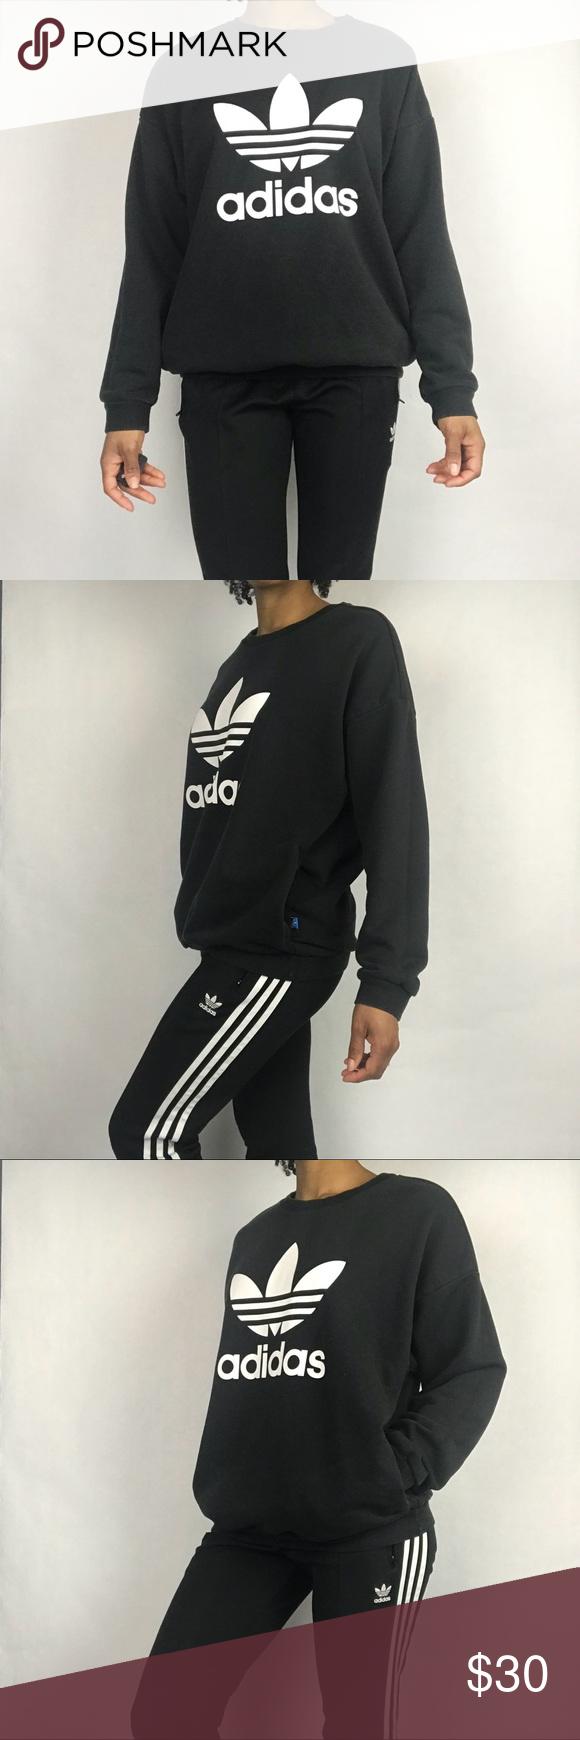 Adidas Originals Trefoil Logo Sweatshirt W Pockets Sweatshirts Adidas Tops Crew Neck Sweatshirt [ 1740 x 580 Pixel ]